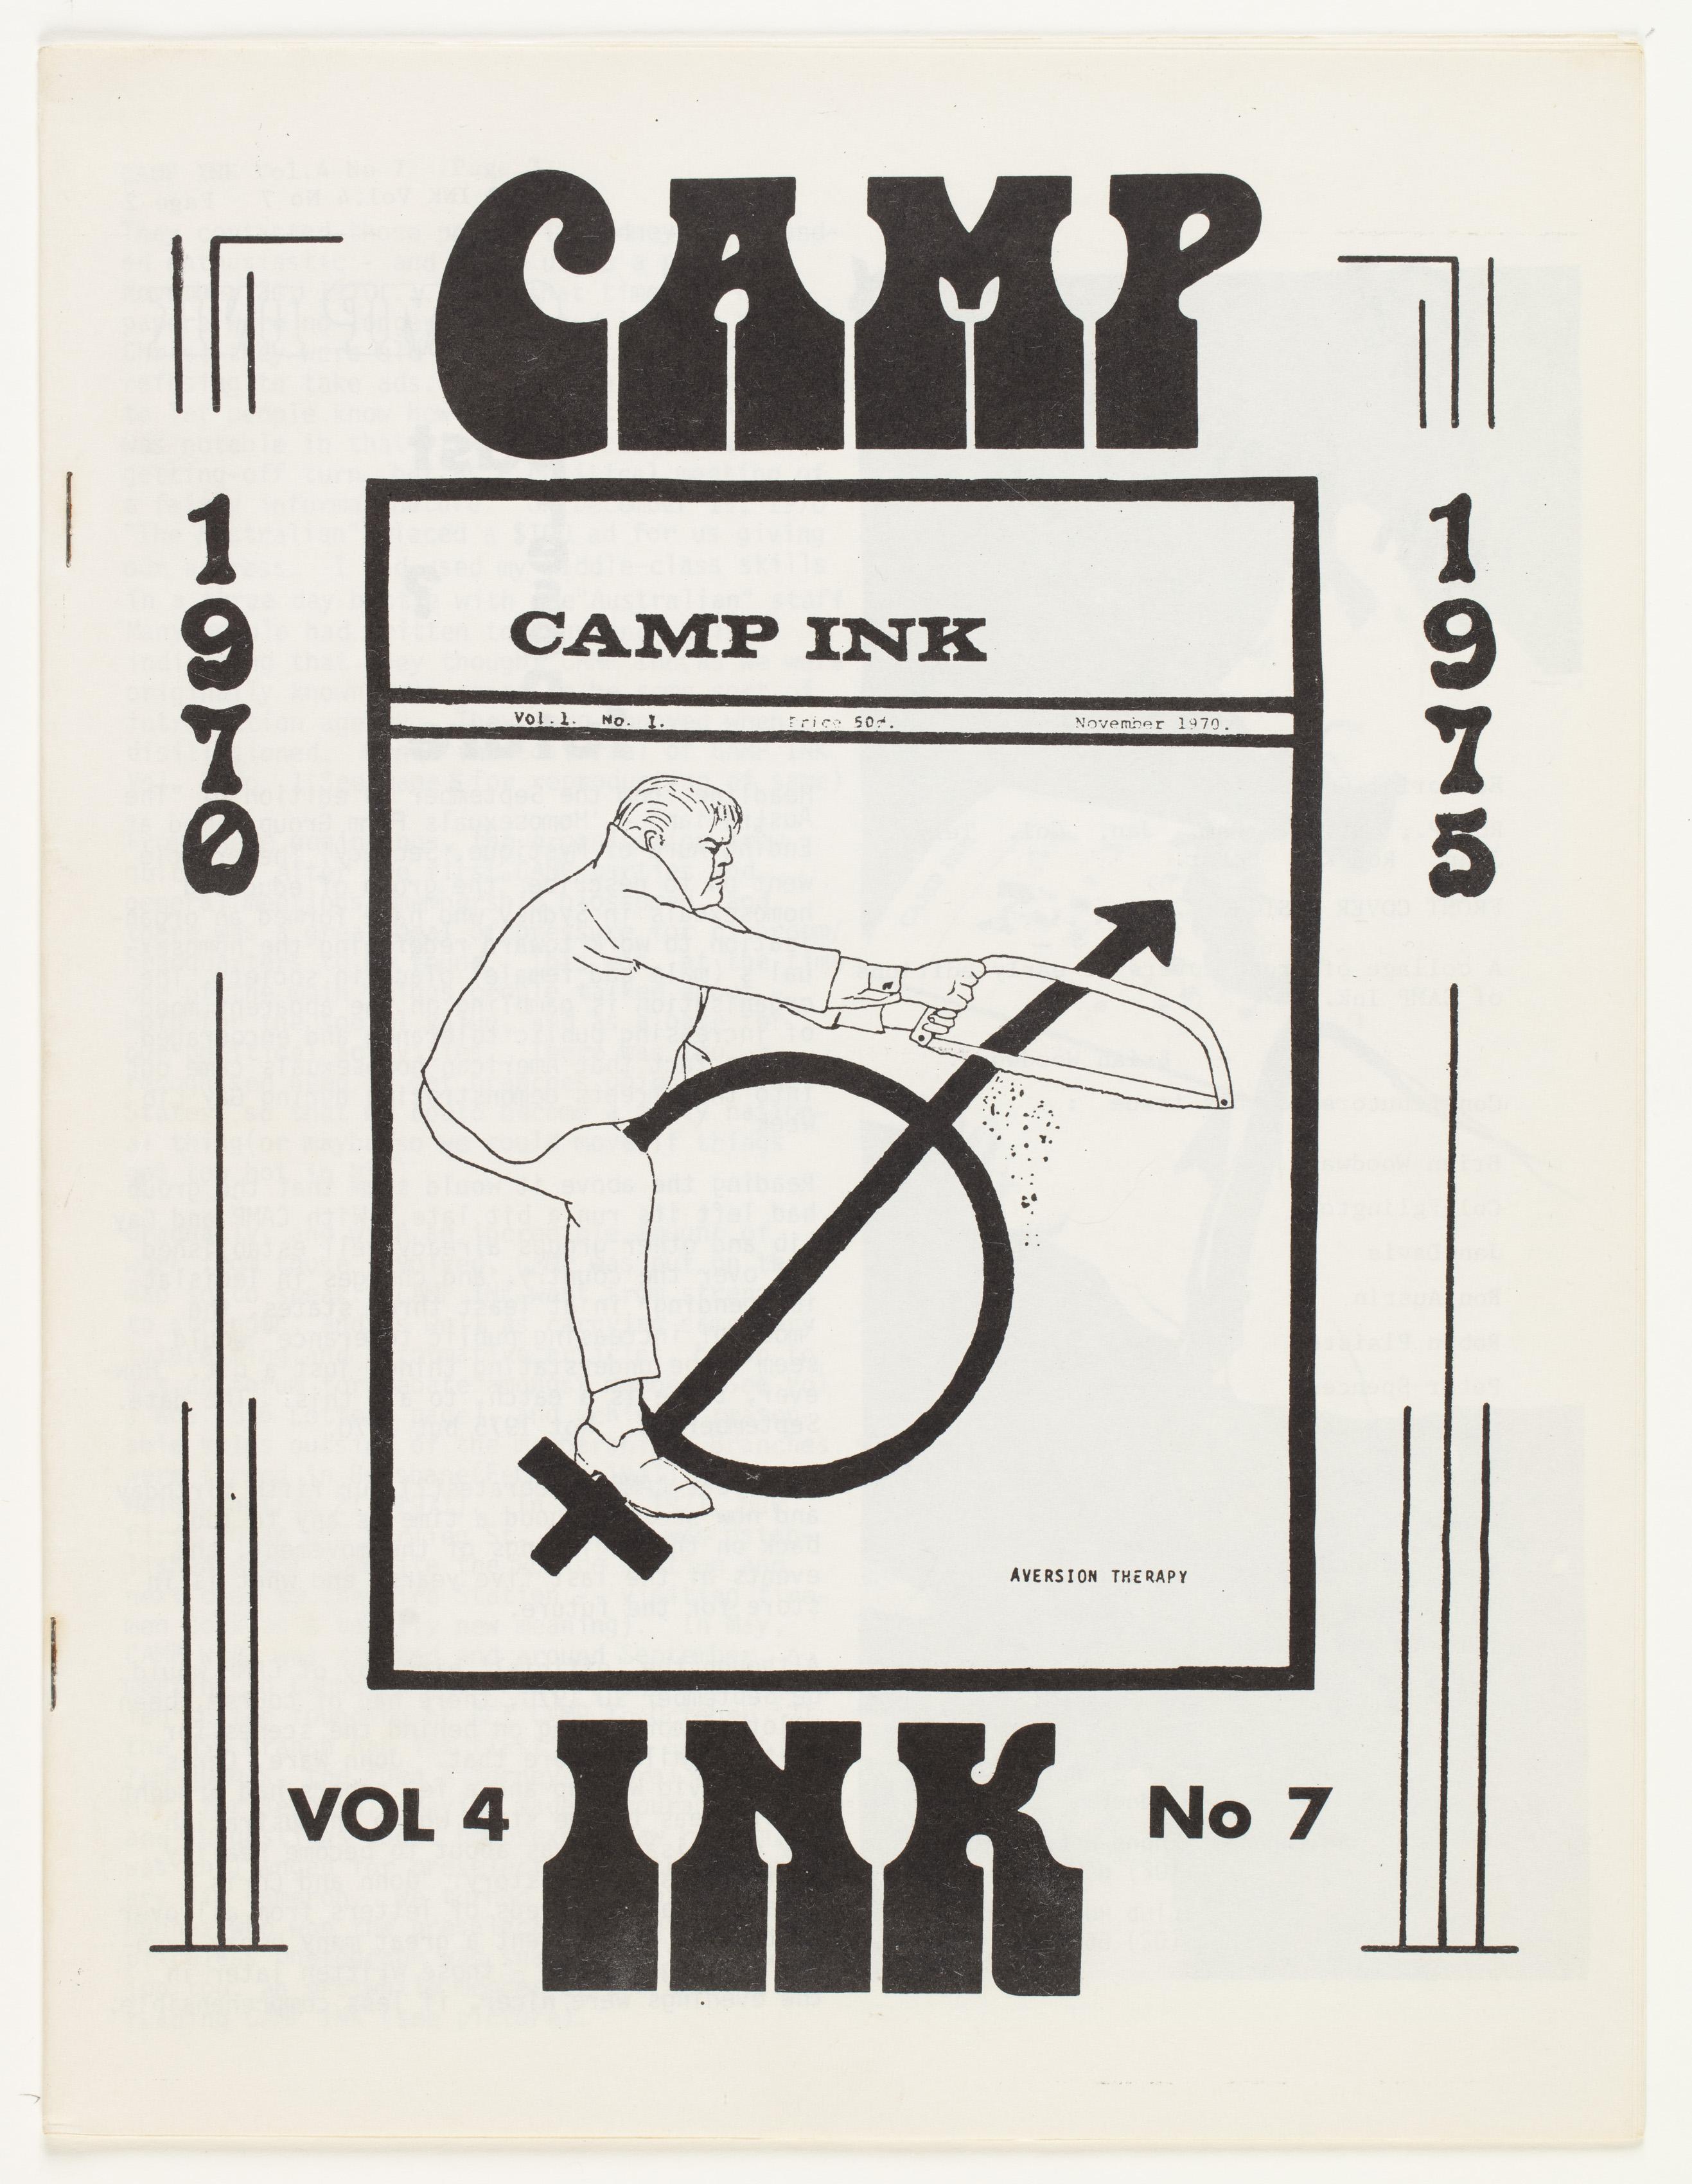 Camp Ink. Vol. 4, No.7 (July 1975)